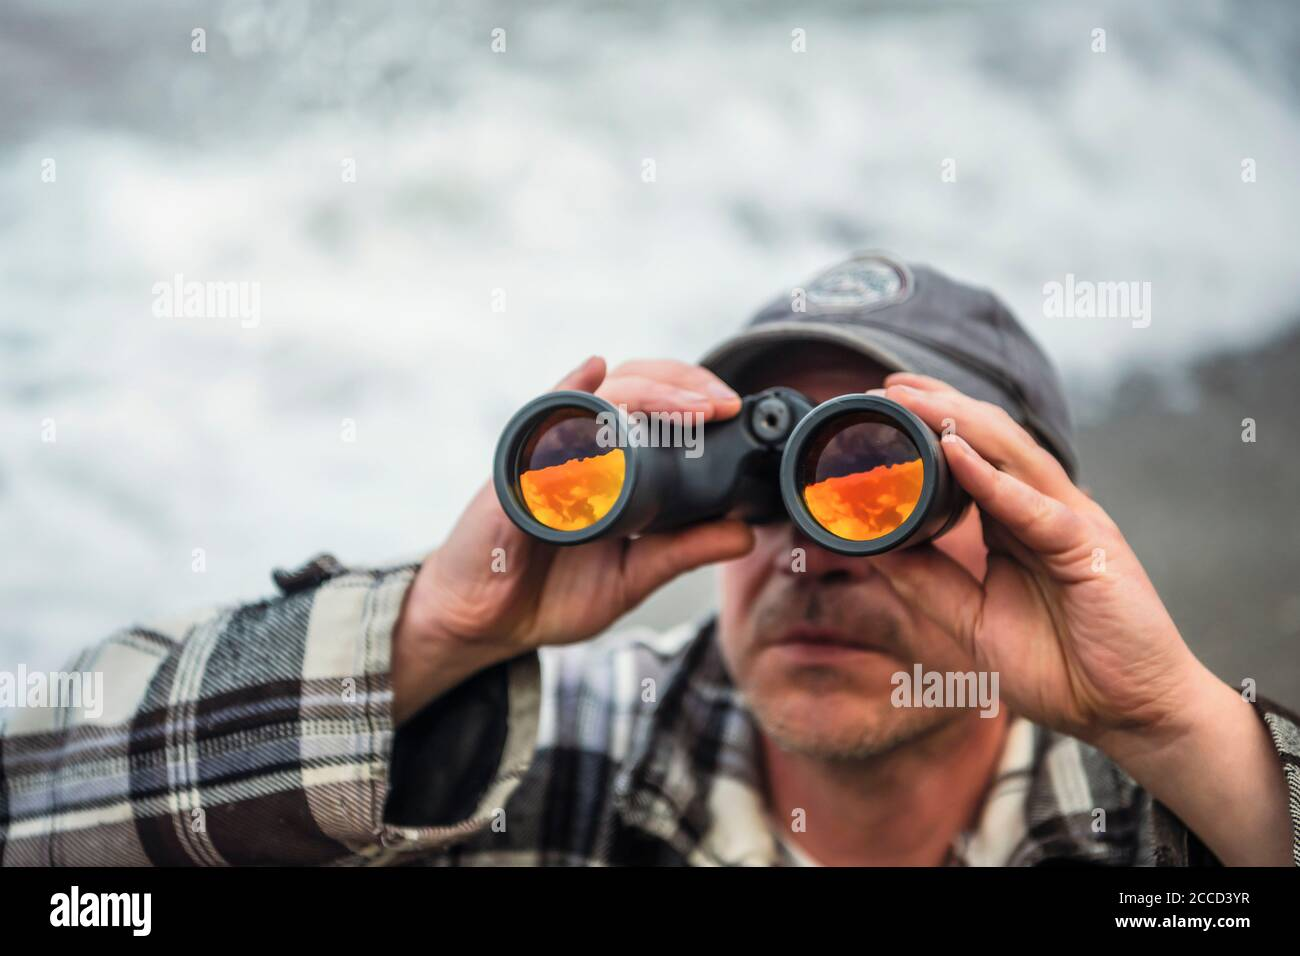 Close up shot of man looking through binoculars with not visible face. Stock Photo